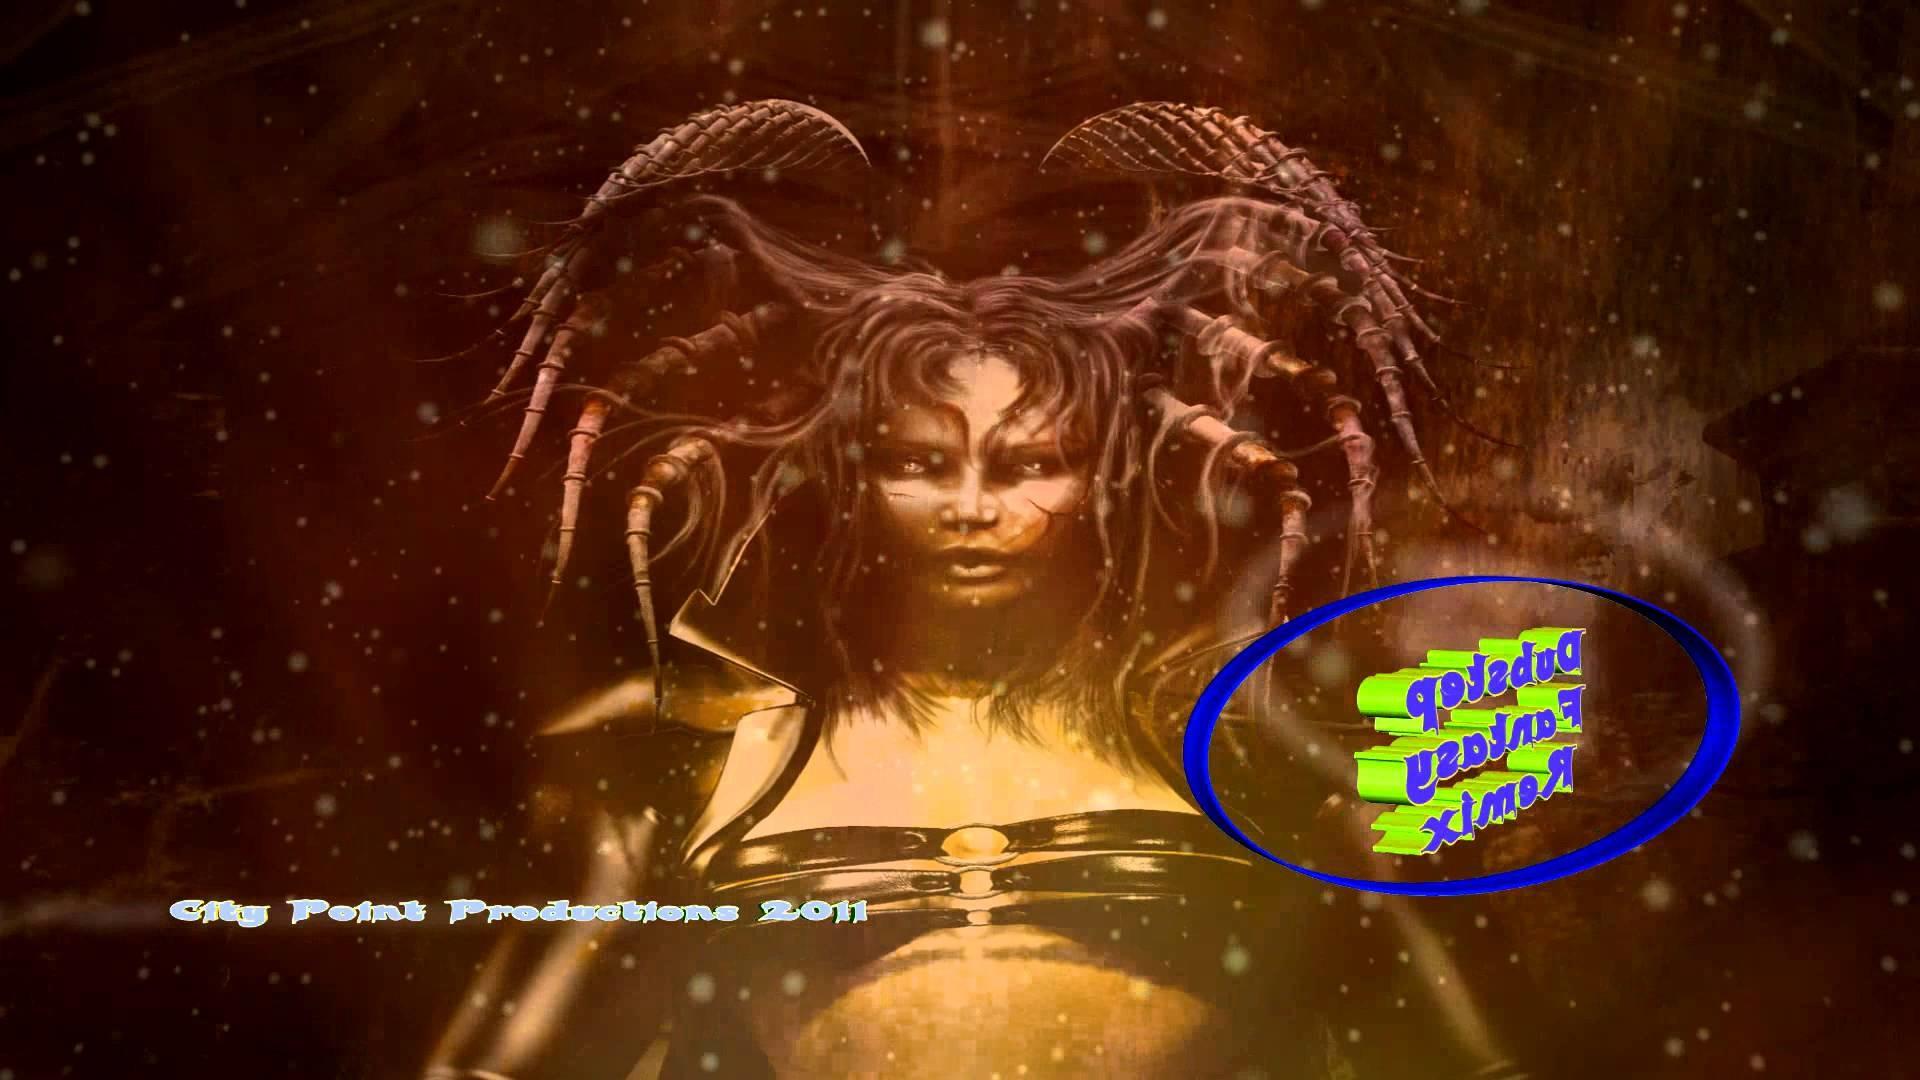 Dubstep Fantasy Remix – Sexy Female Demon HD Wallpaper